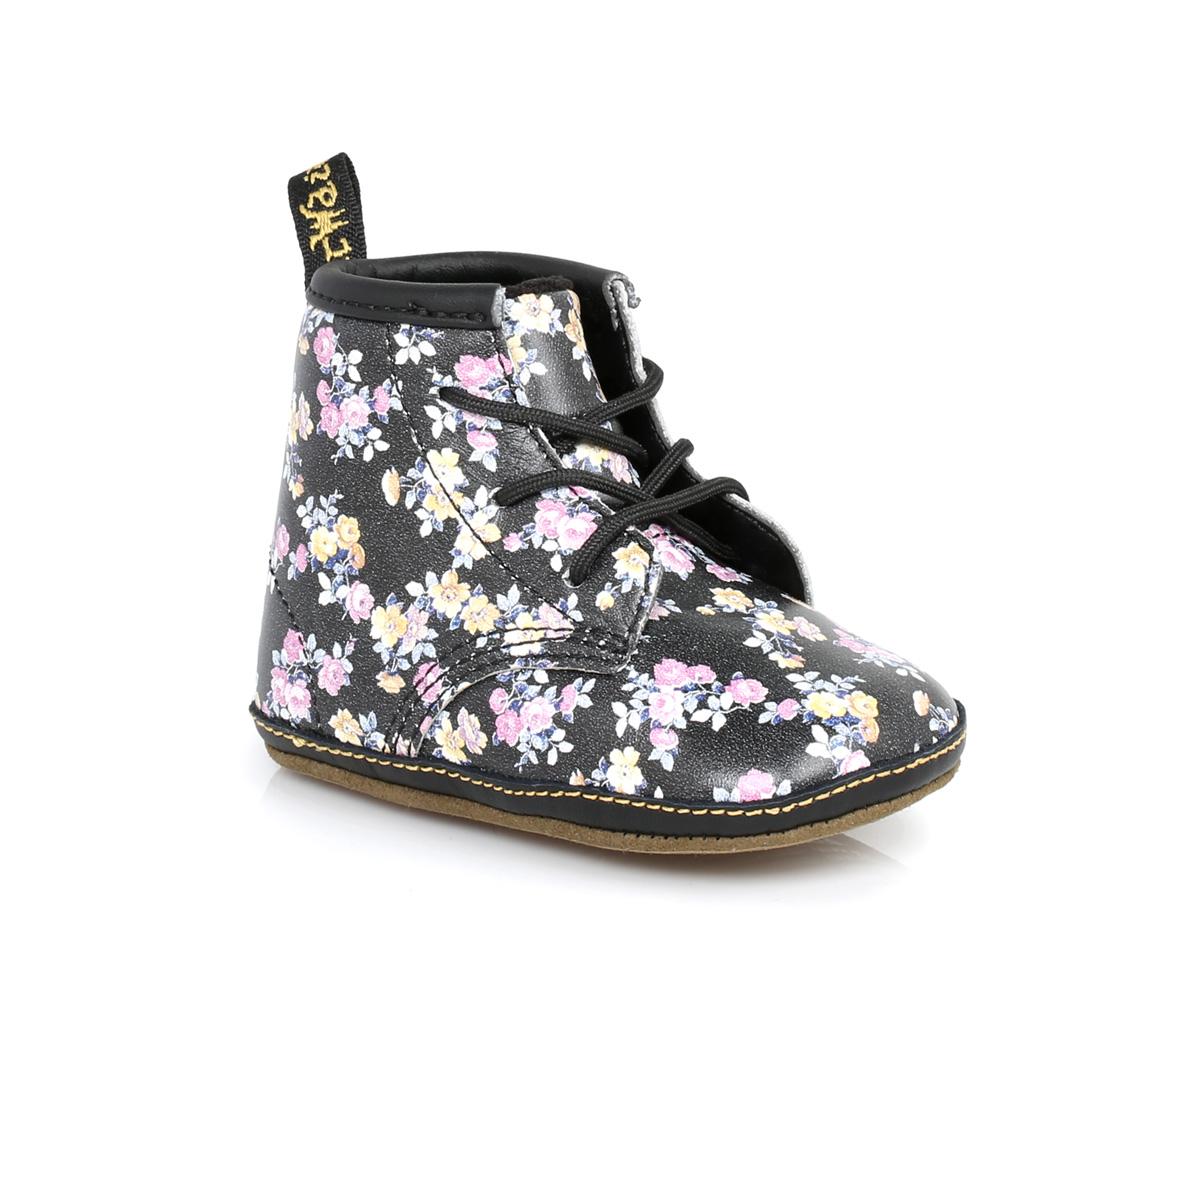 Dr Martens Baby Black Floral Auburn Kids Leather Boots sizes 0-3 ...